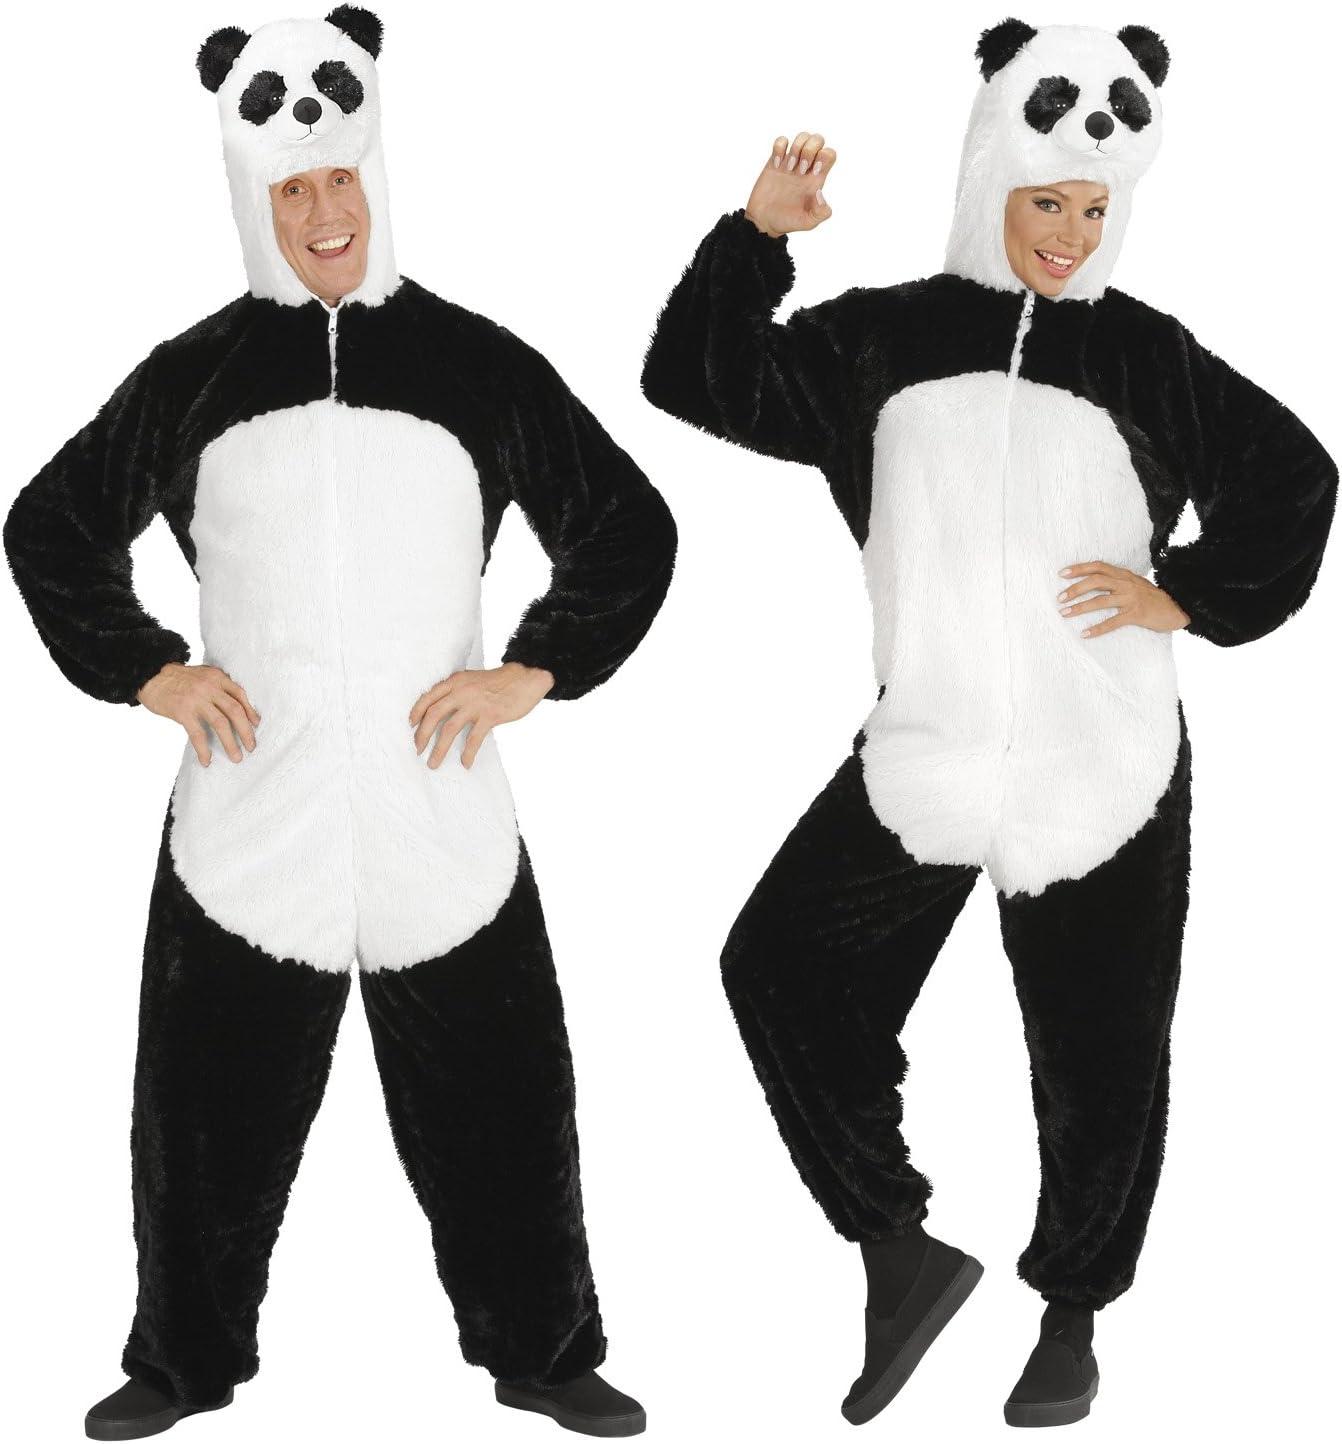 WIDMANN wdm97120 ? Disfraz oso panda de peluche, negro, large ...